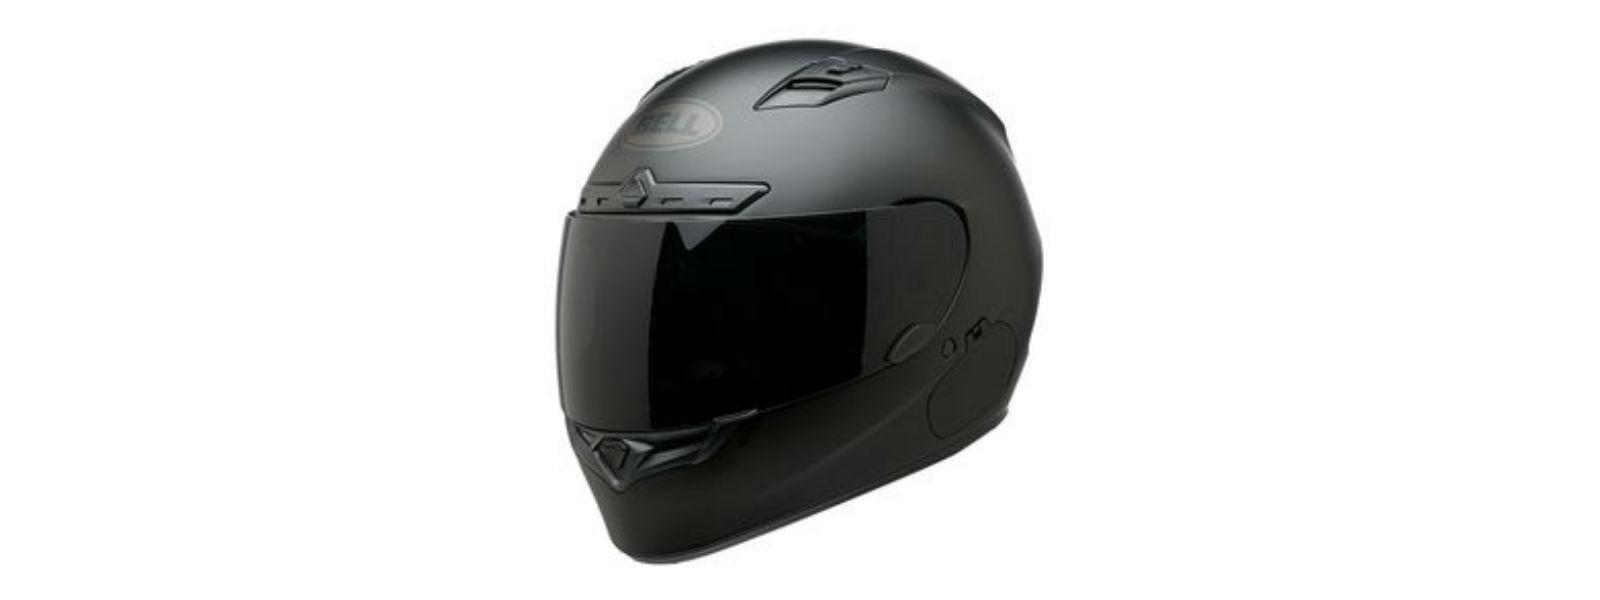 Strict enforcement of full-face helmet regulation